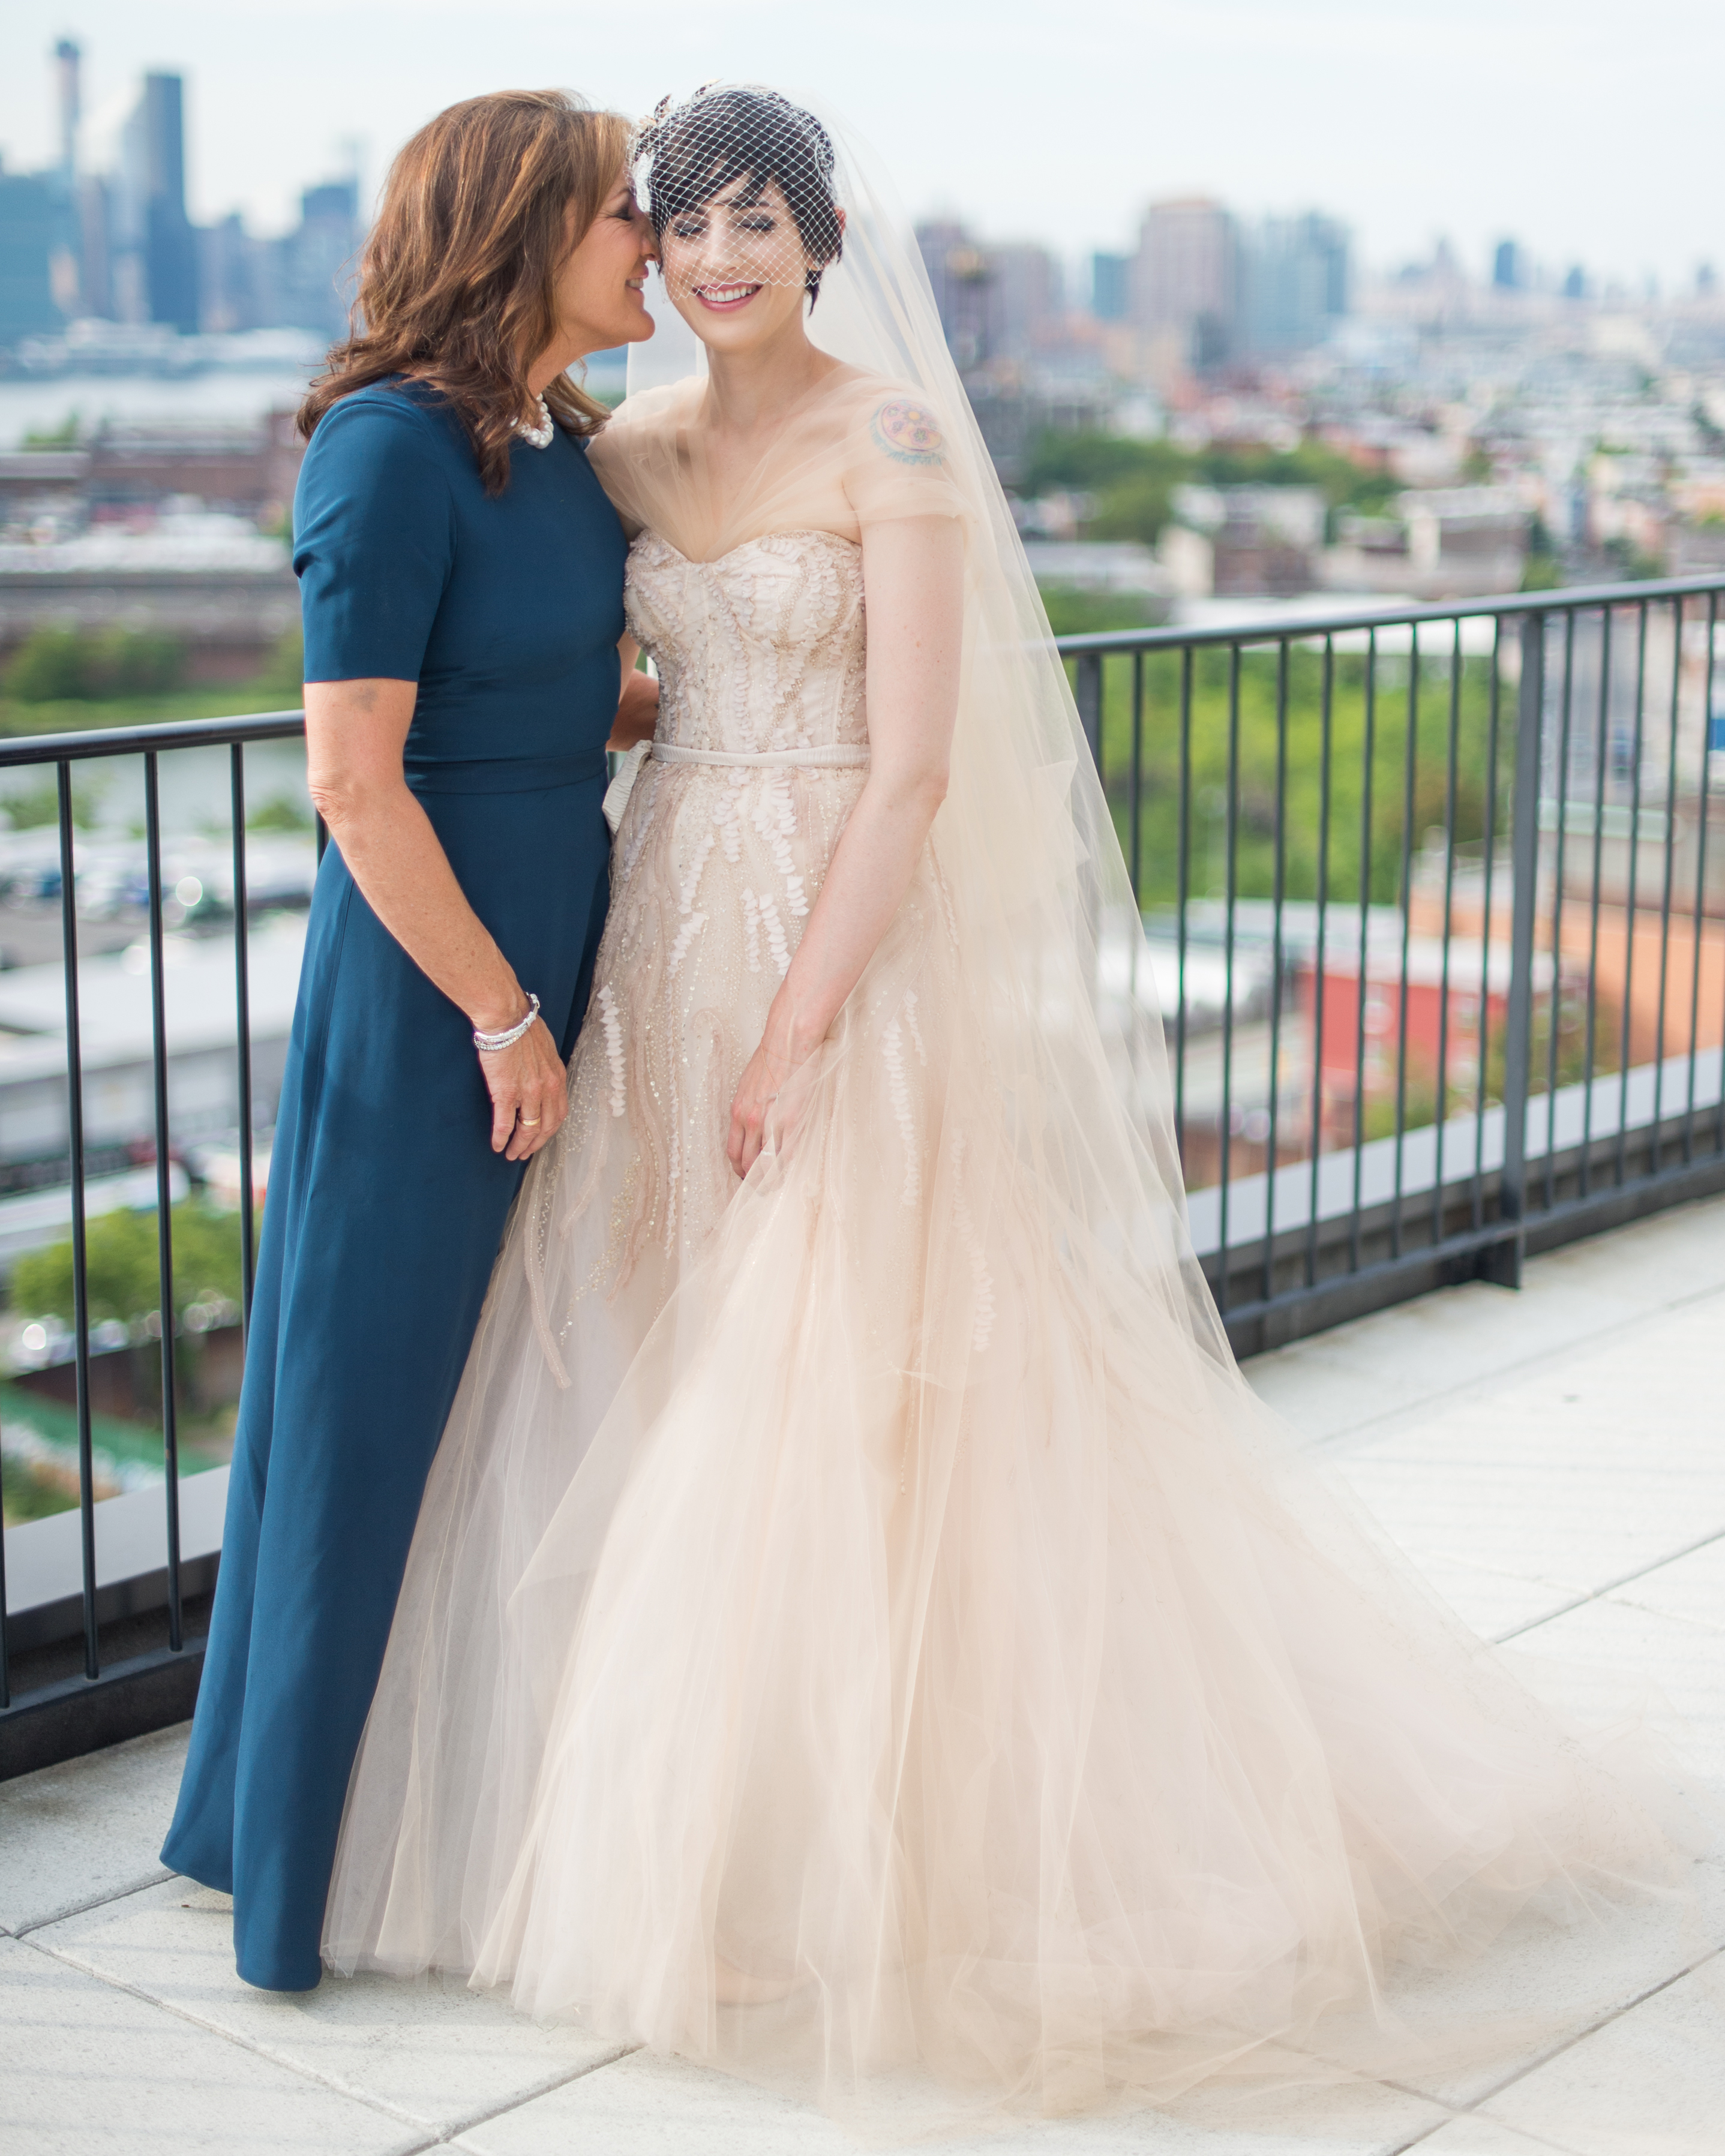 caitlin-michael-wedding-mom-154-s111835-0415.jpg